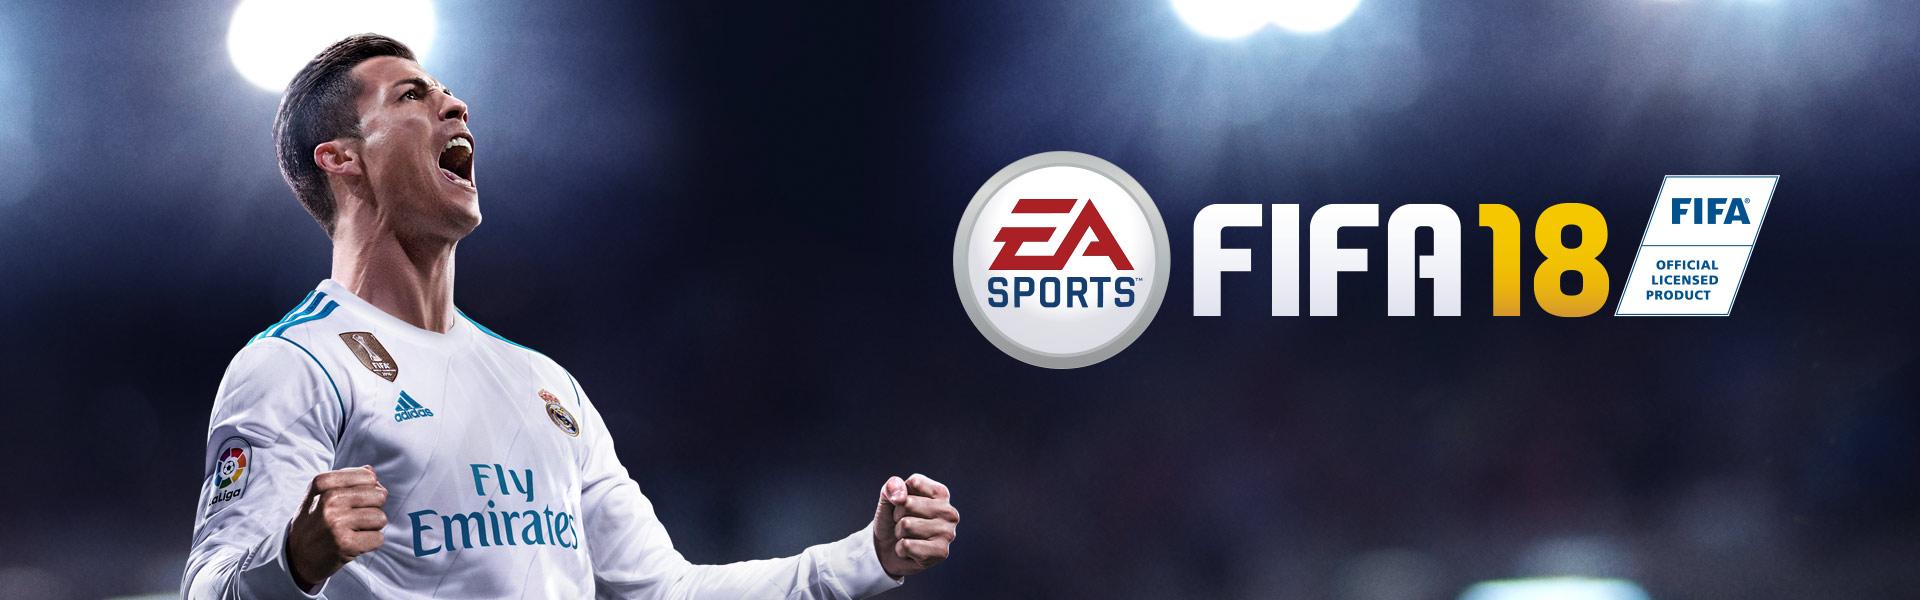 Produit sous licence officielle EA Sports FIFA18, Cristiano Ronaldo heureux